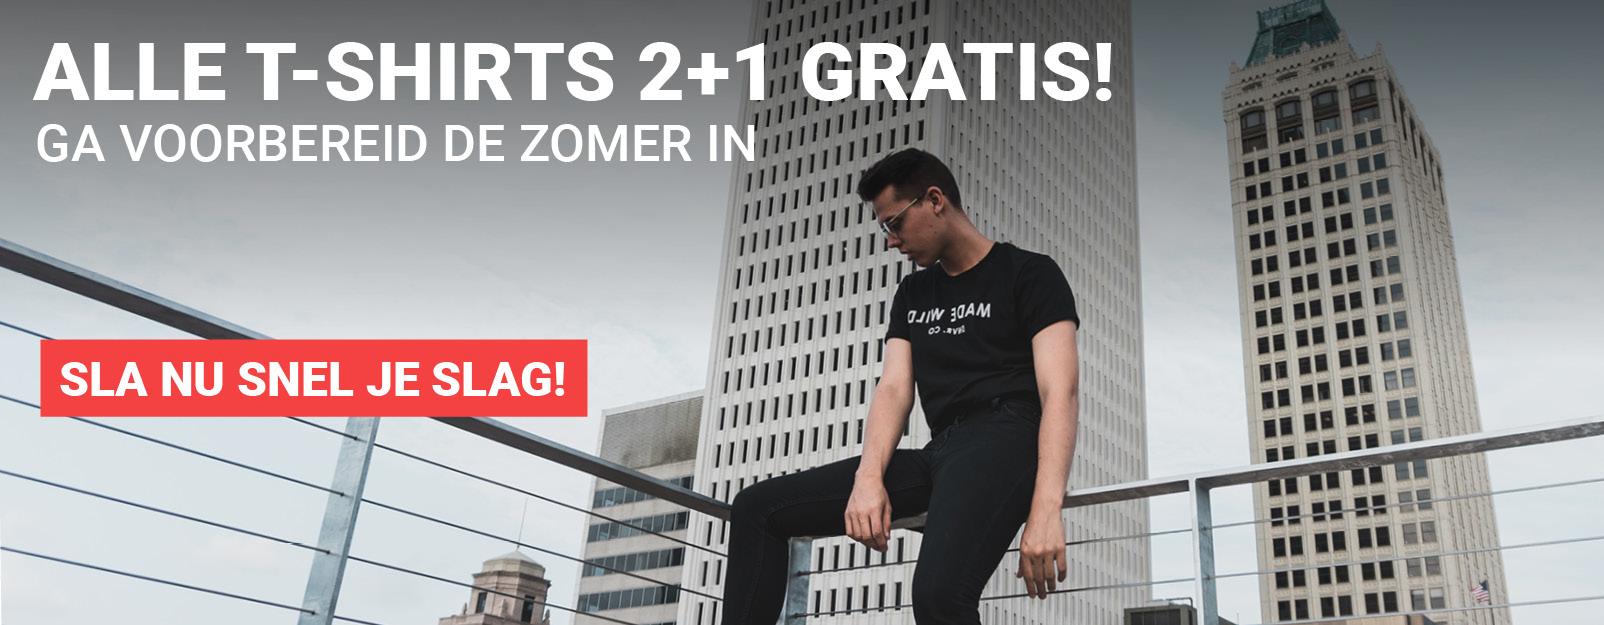 Alle T-shirts 2+1 gratis!